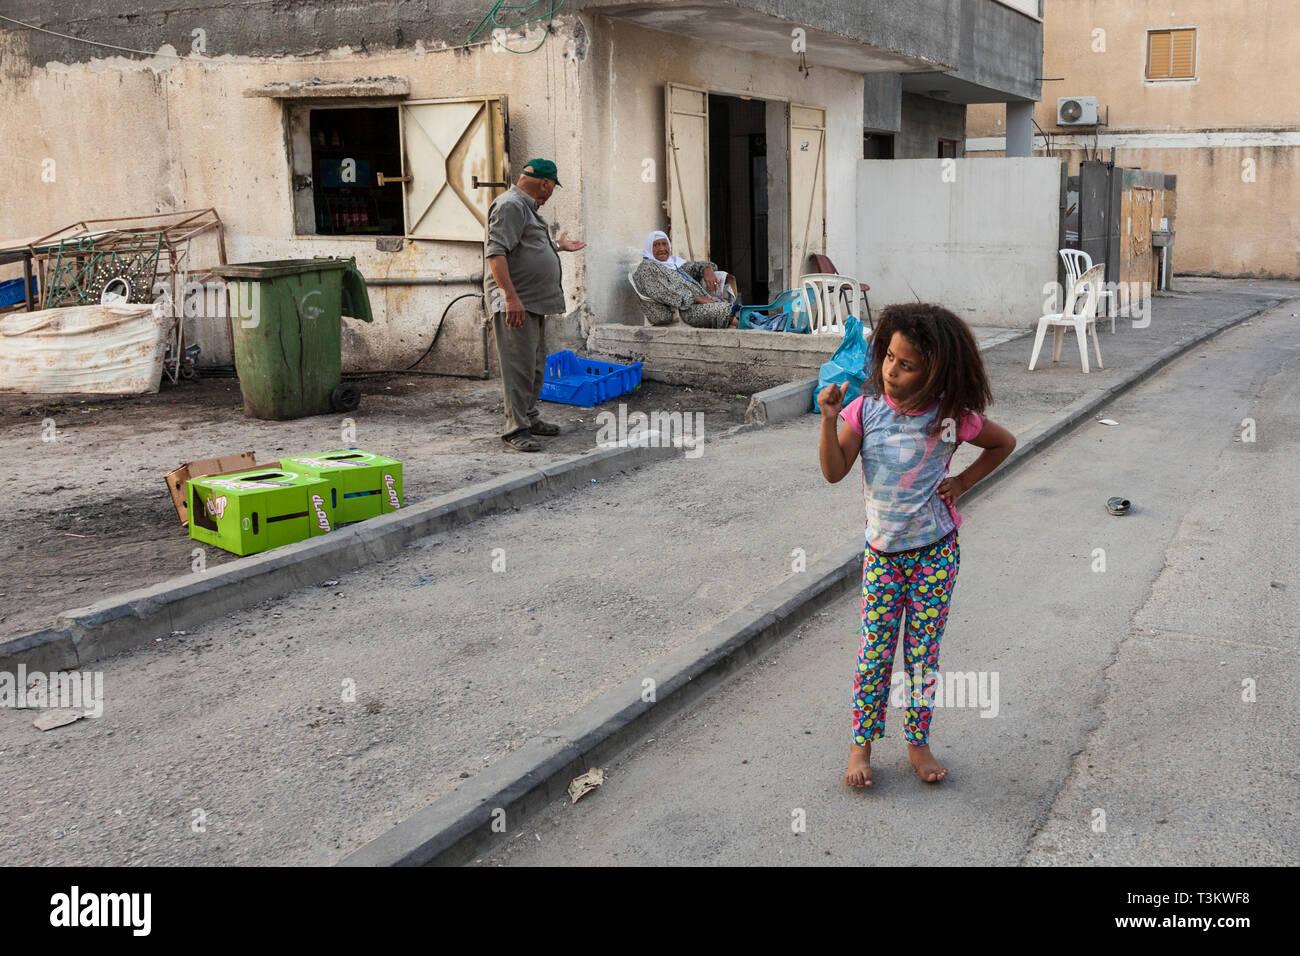 Jisr az-Zarqa, Israel - Stock Image